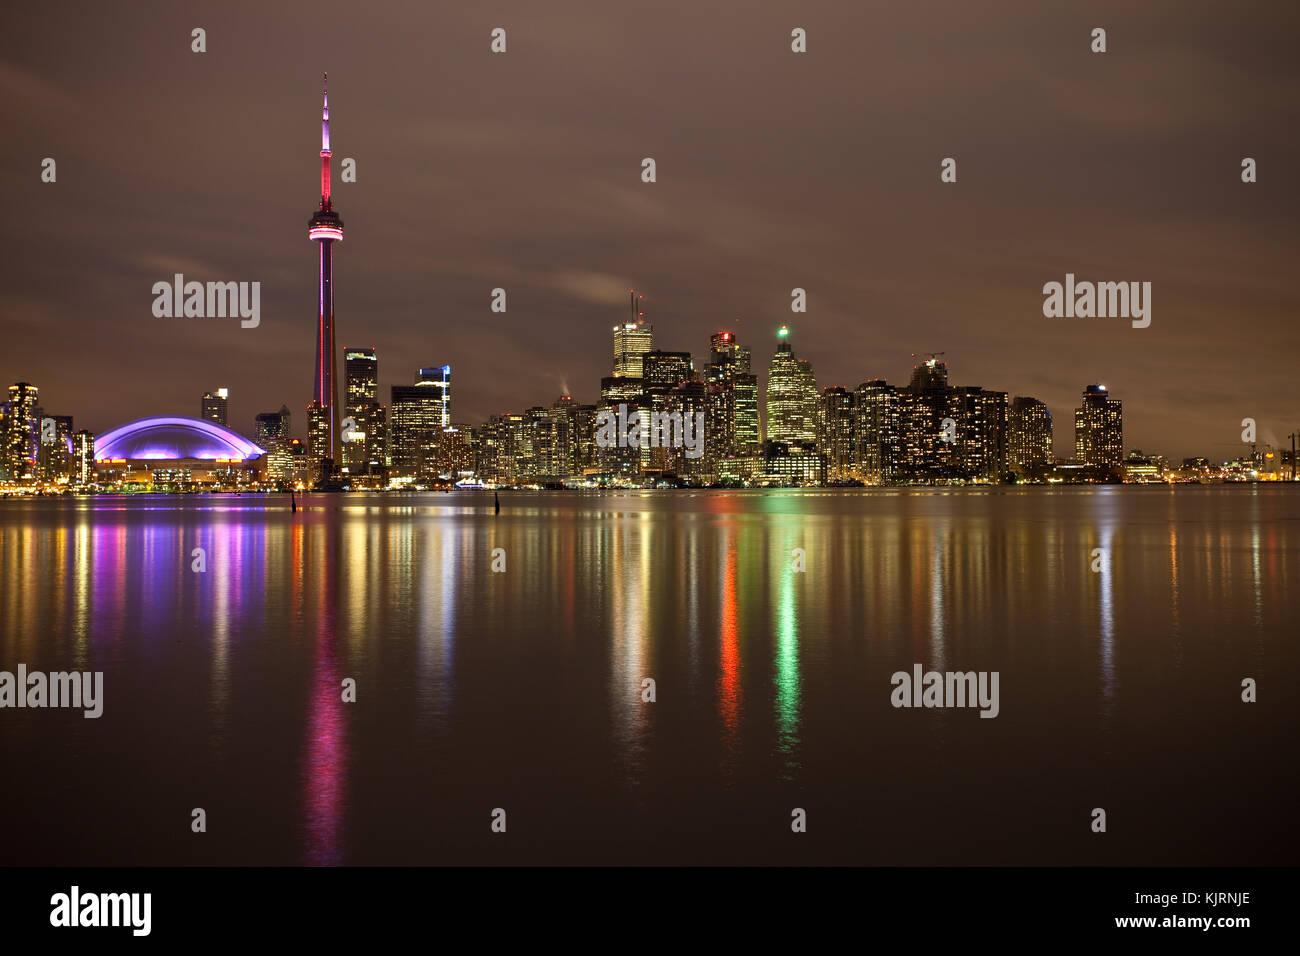 Skyline von Toronto - Kanada - Lake Ontario, Nordamerika Stockfoto